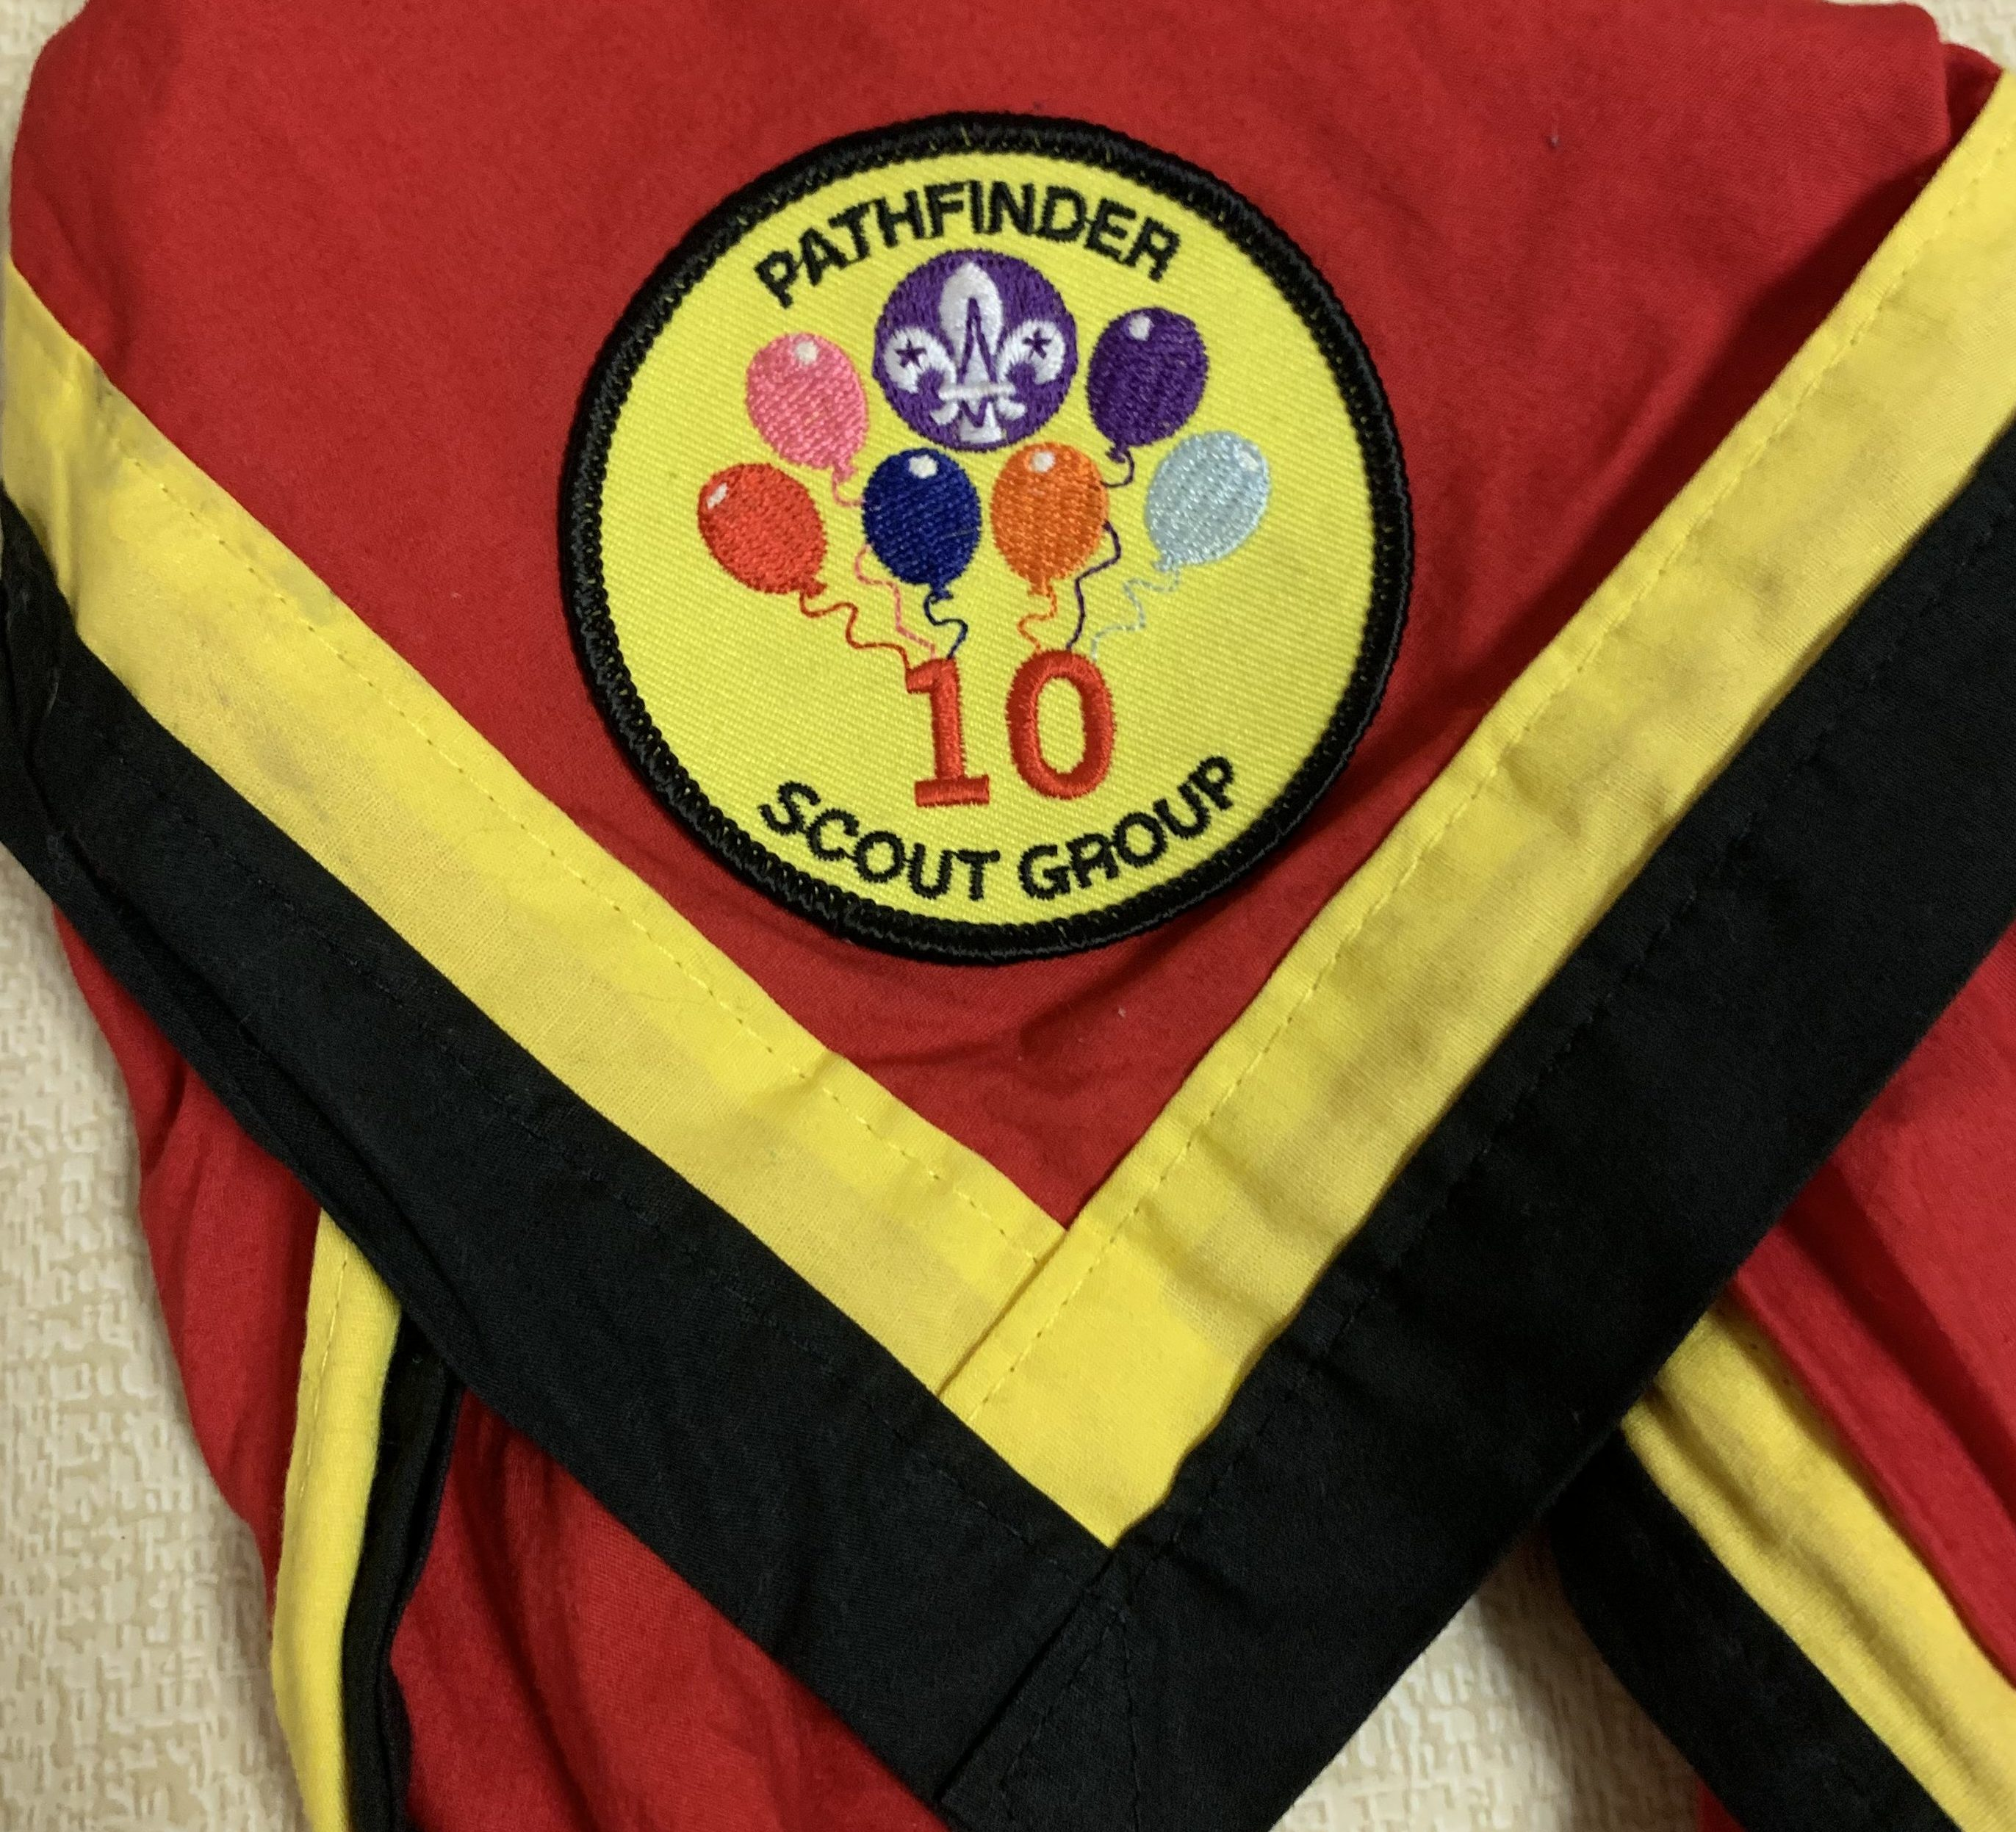 General Scouting